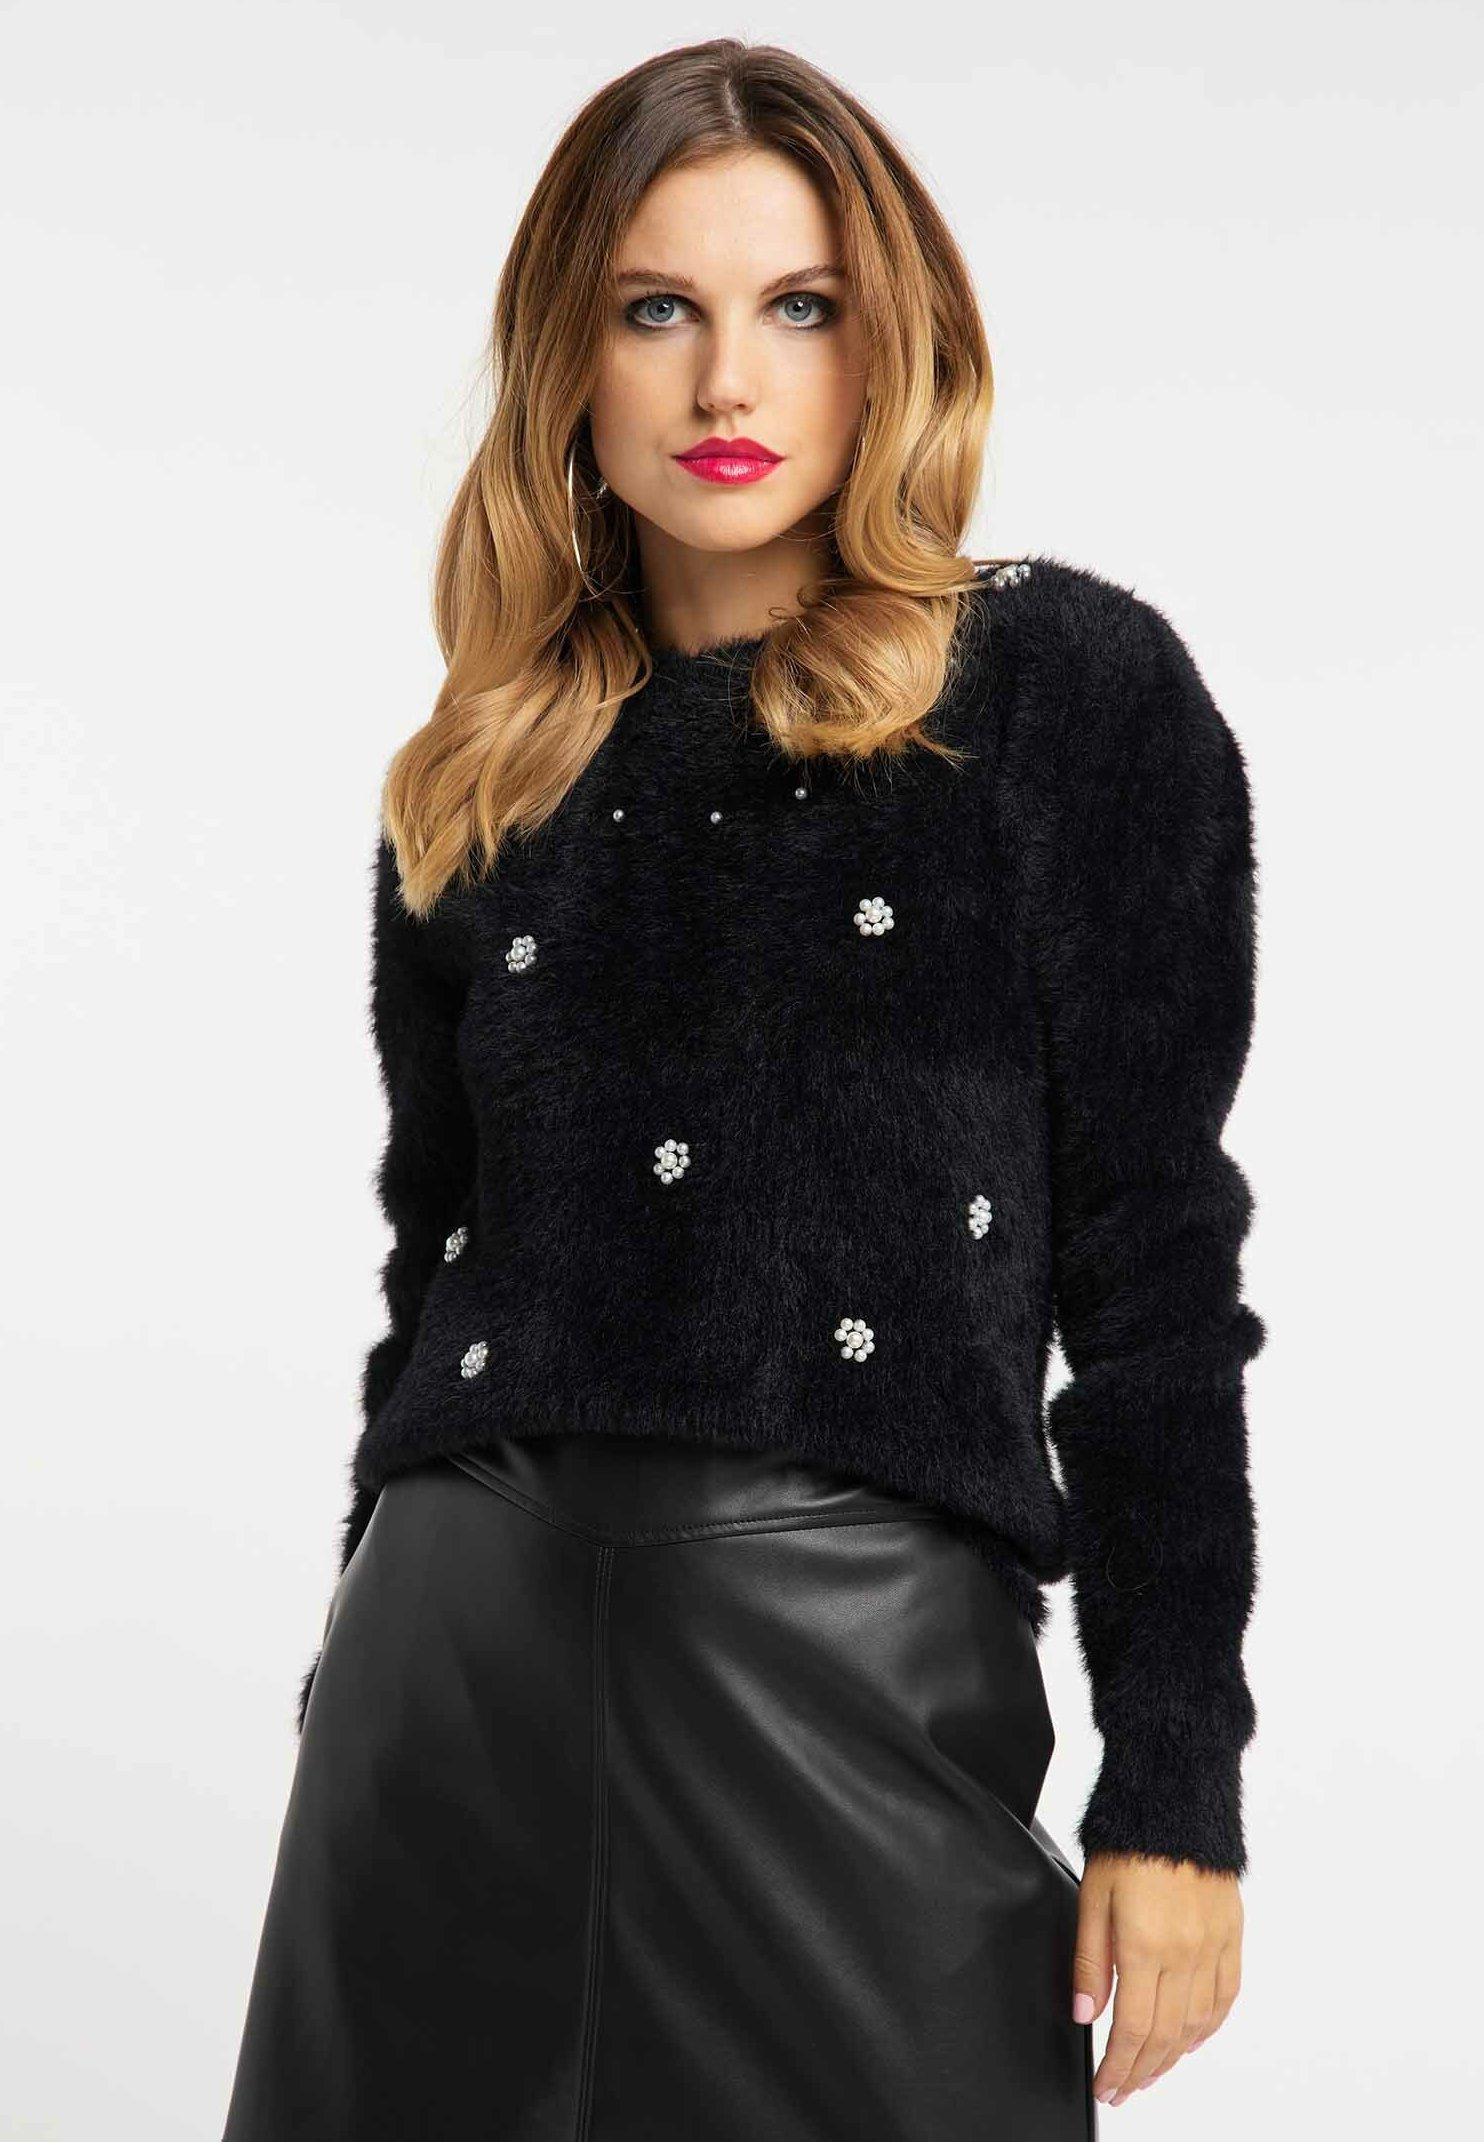 Sale Women's Clothing faina Jumper black wfTRX1nKG